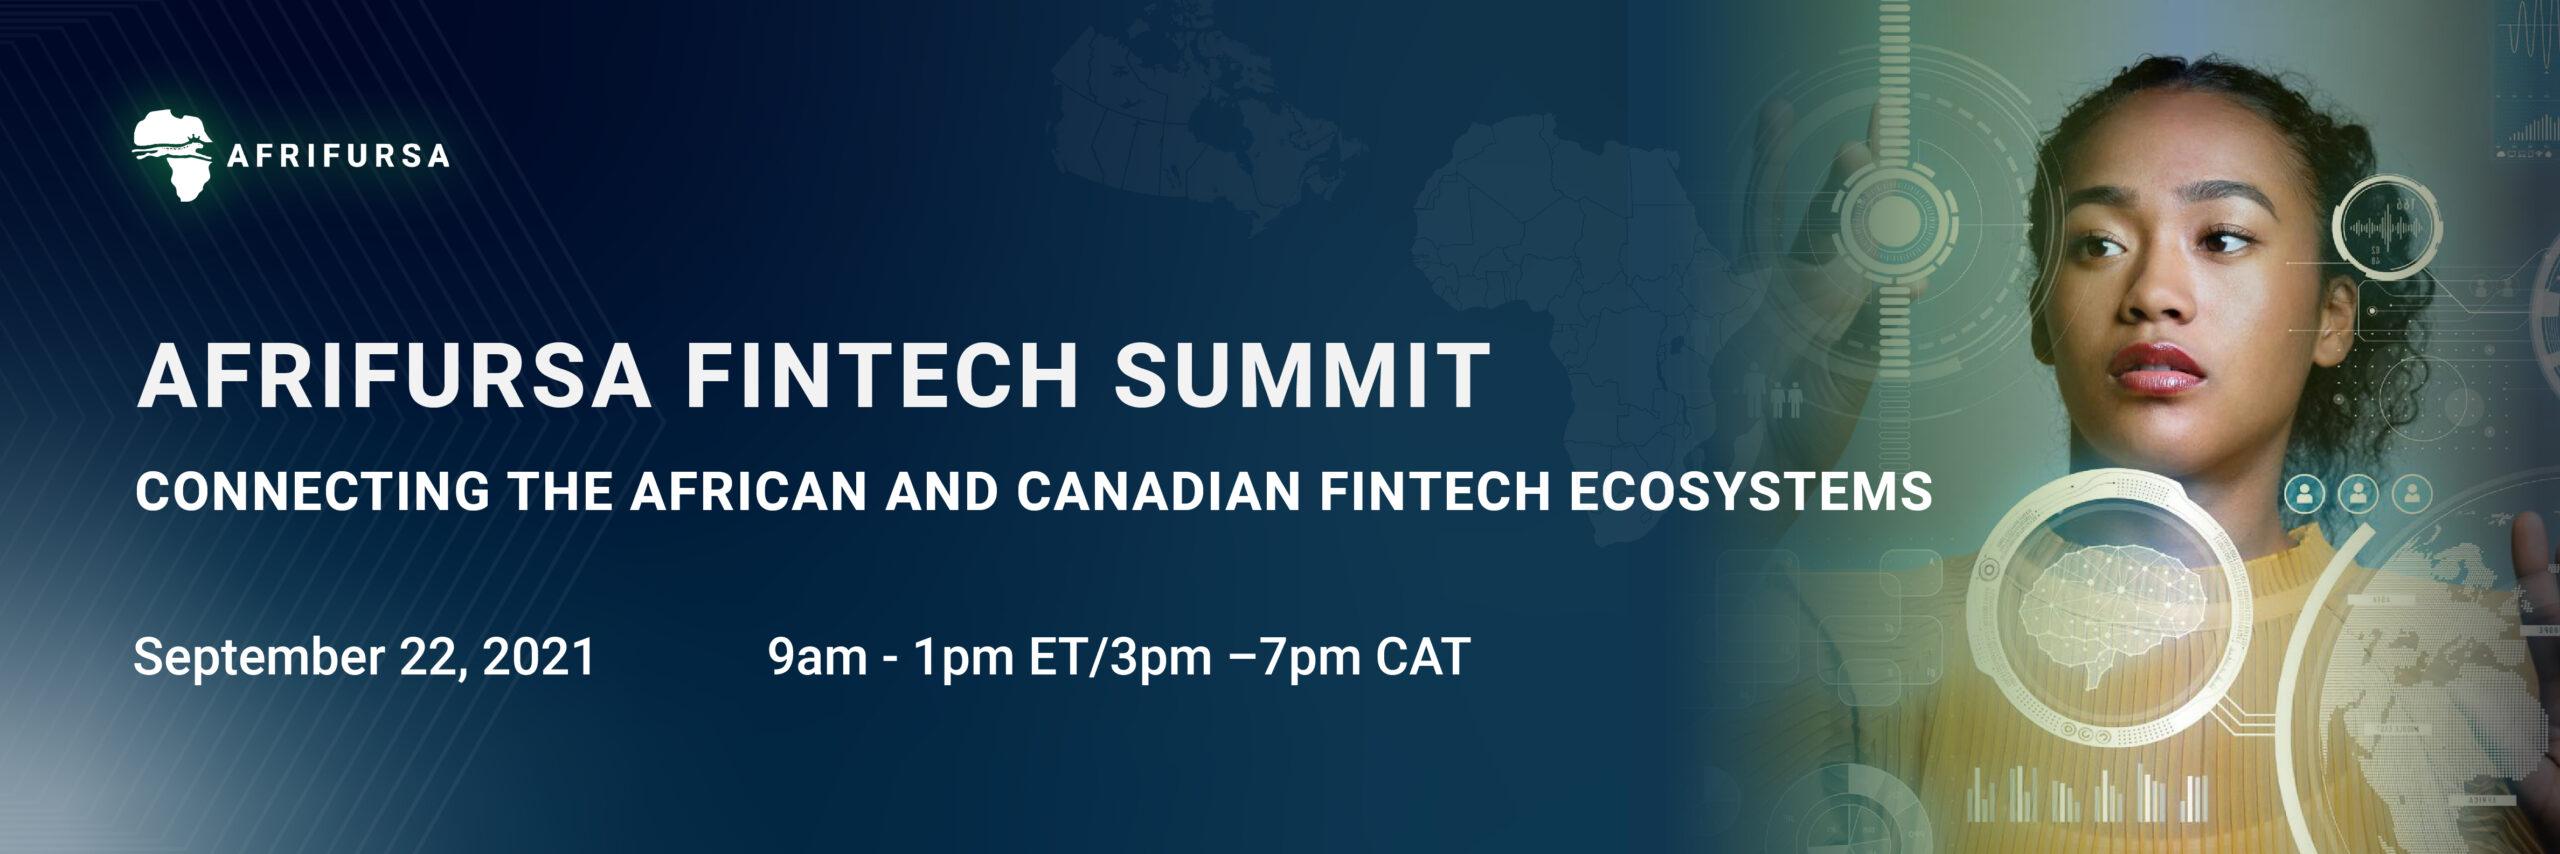 Afrifursa Fintech Summit 2021